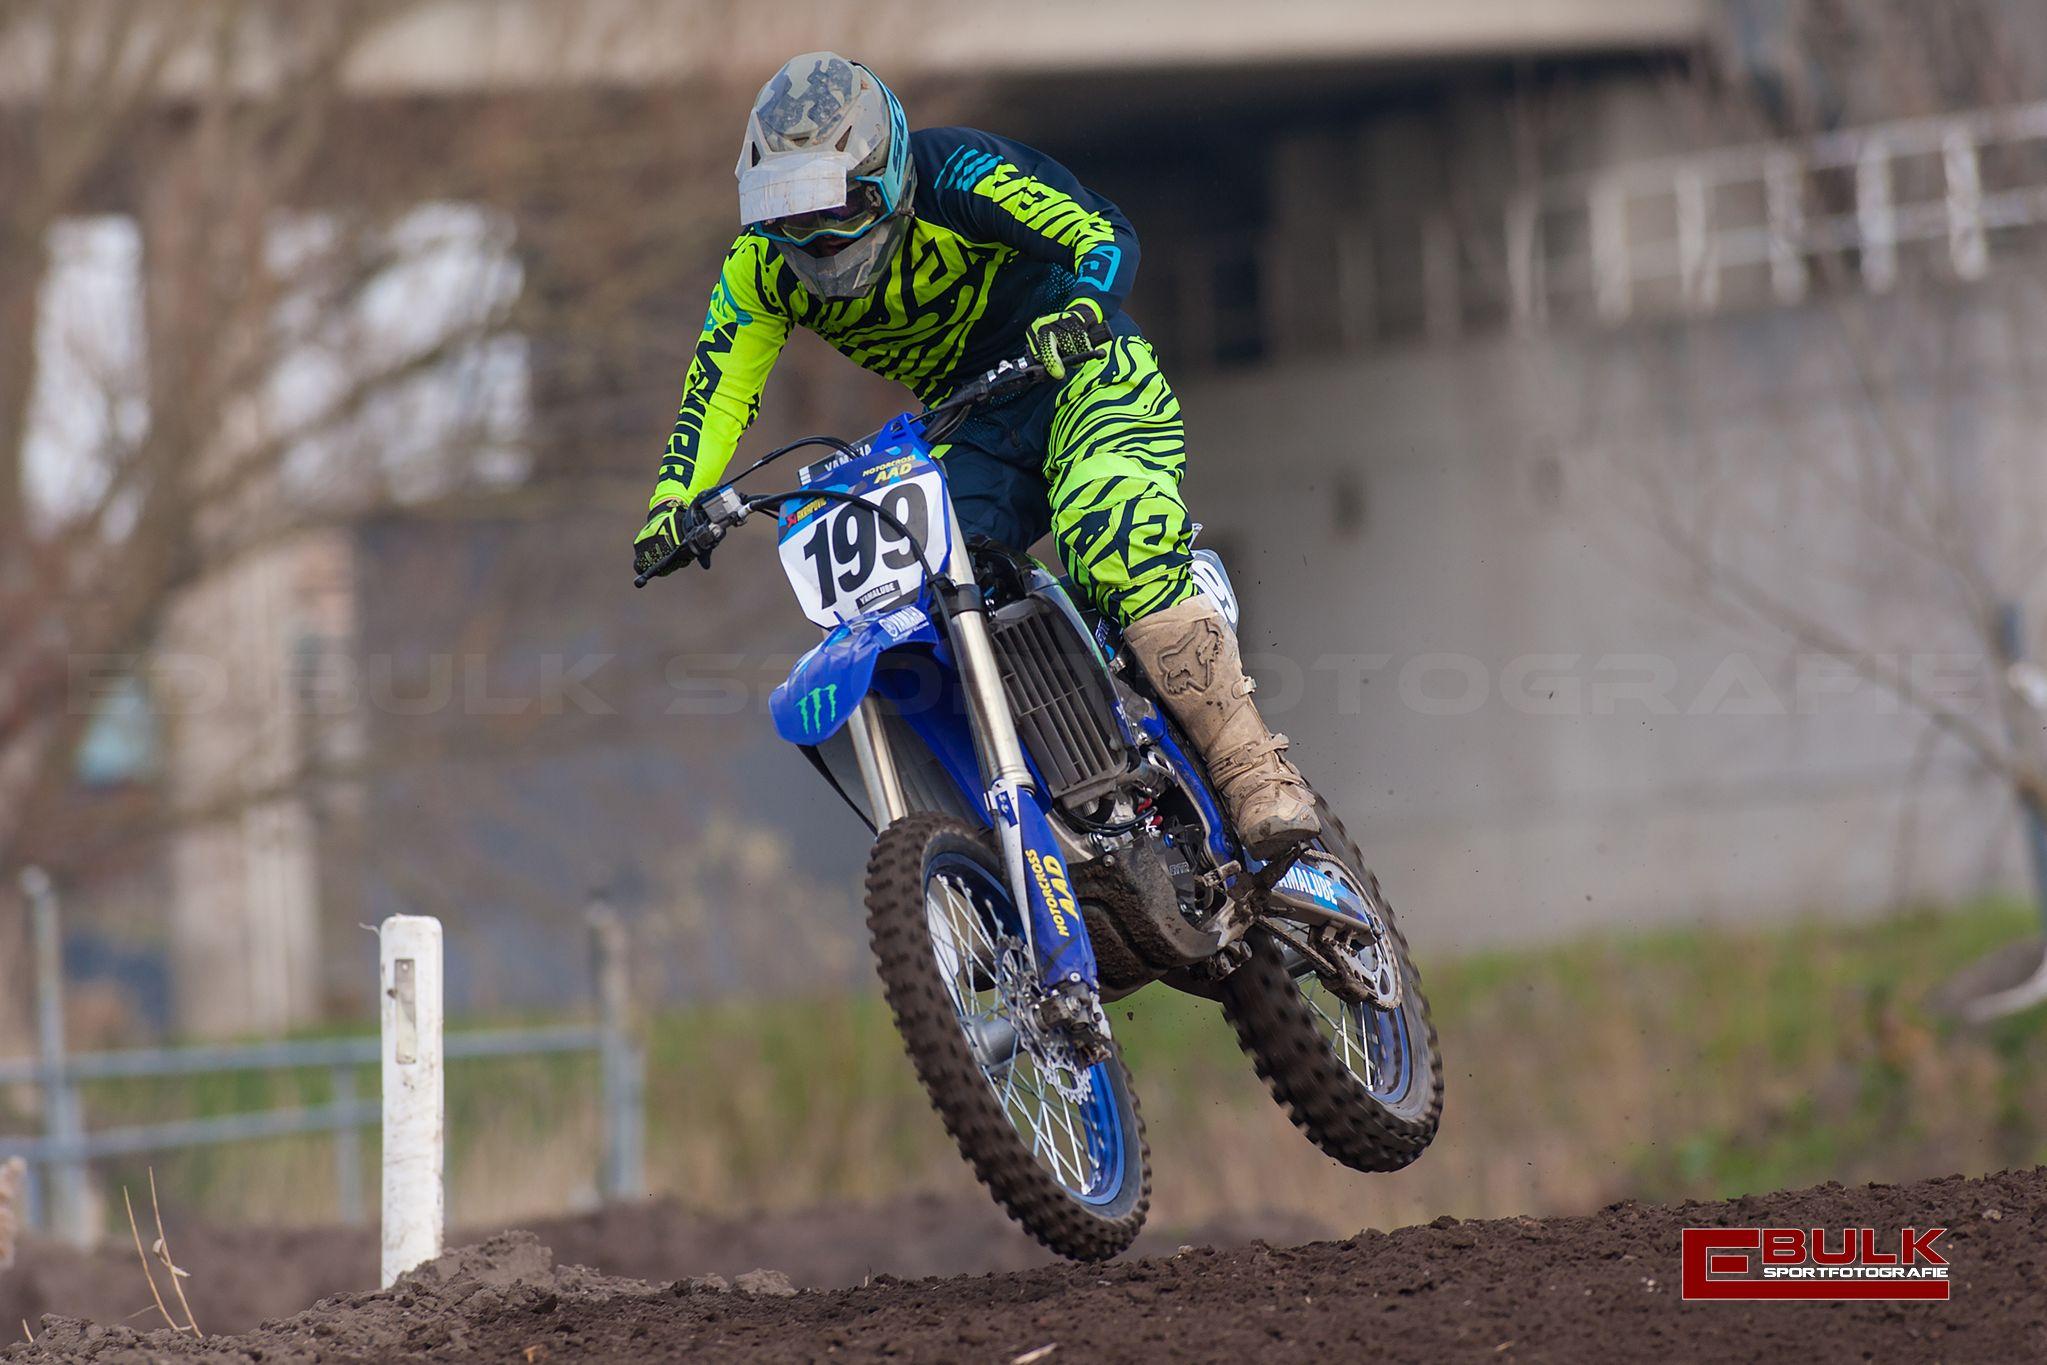 ebs_0239-ed_bulk_sportfotografie